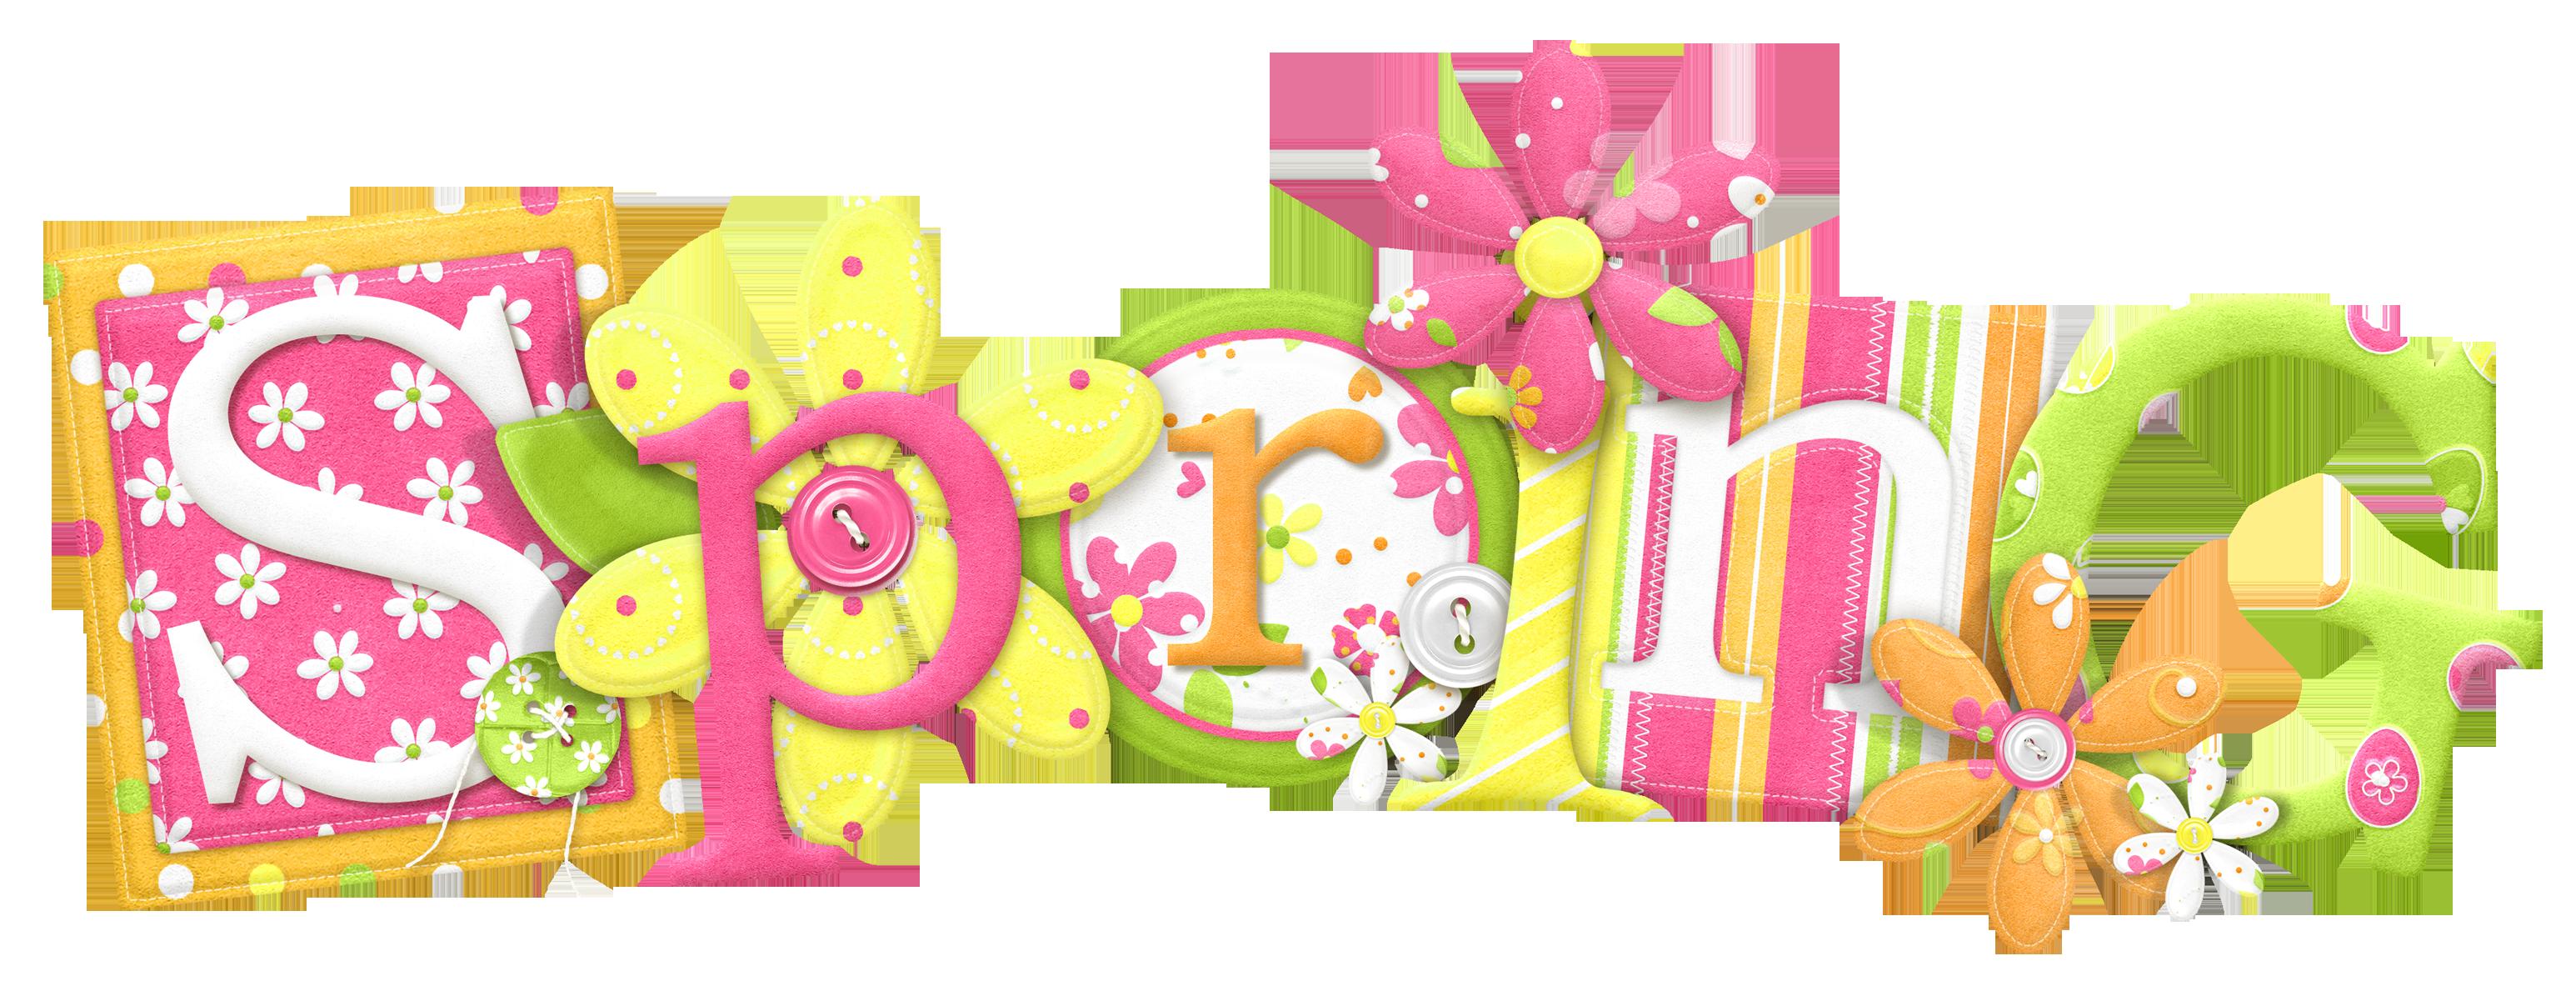 Spring Clip Art Free Clipart Image 2-Spring clip art free clipart image 2-16